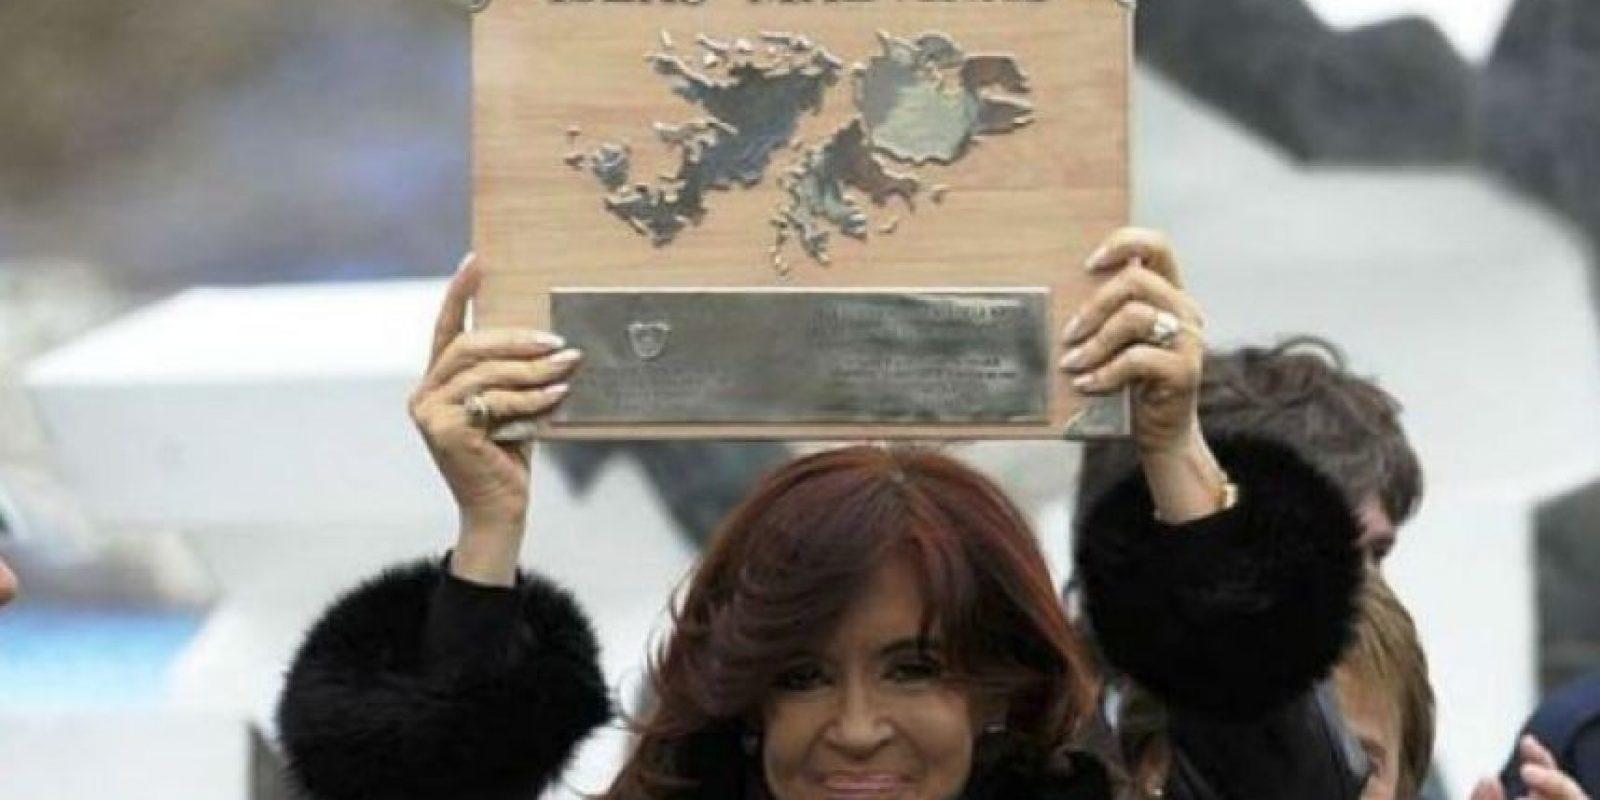 Cristina Fernández de Kirchner, presidenta de Argentina. Foto:Publinews